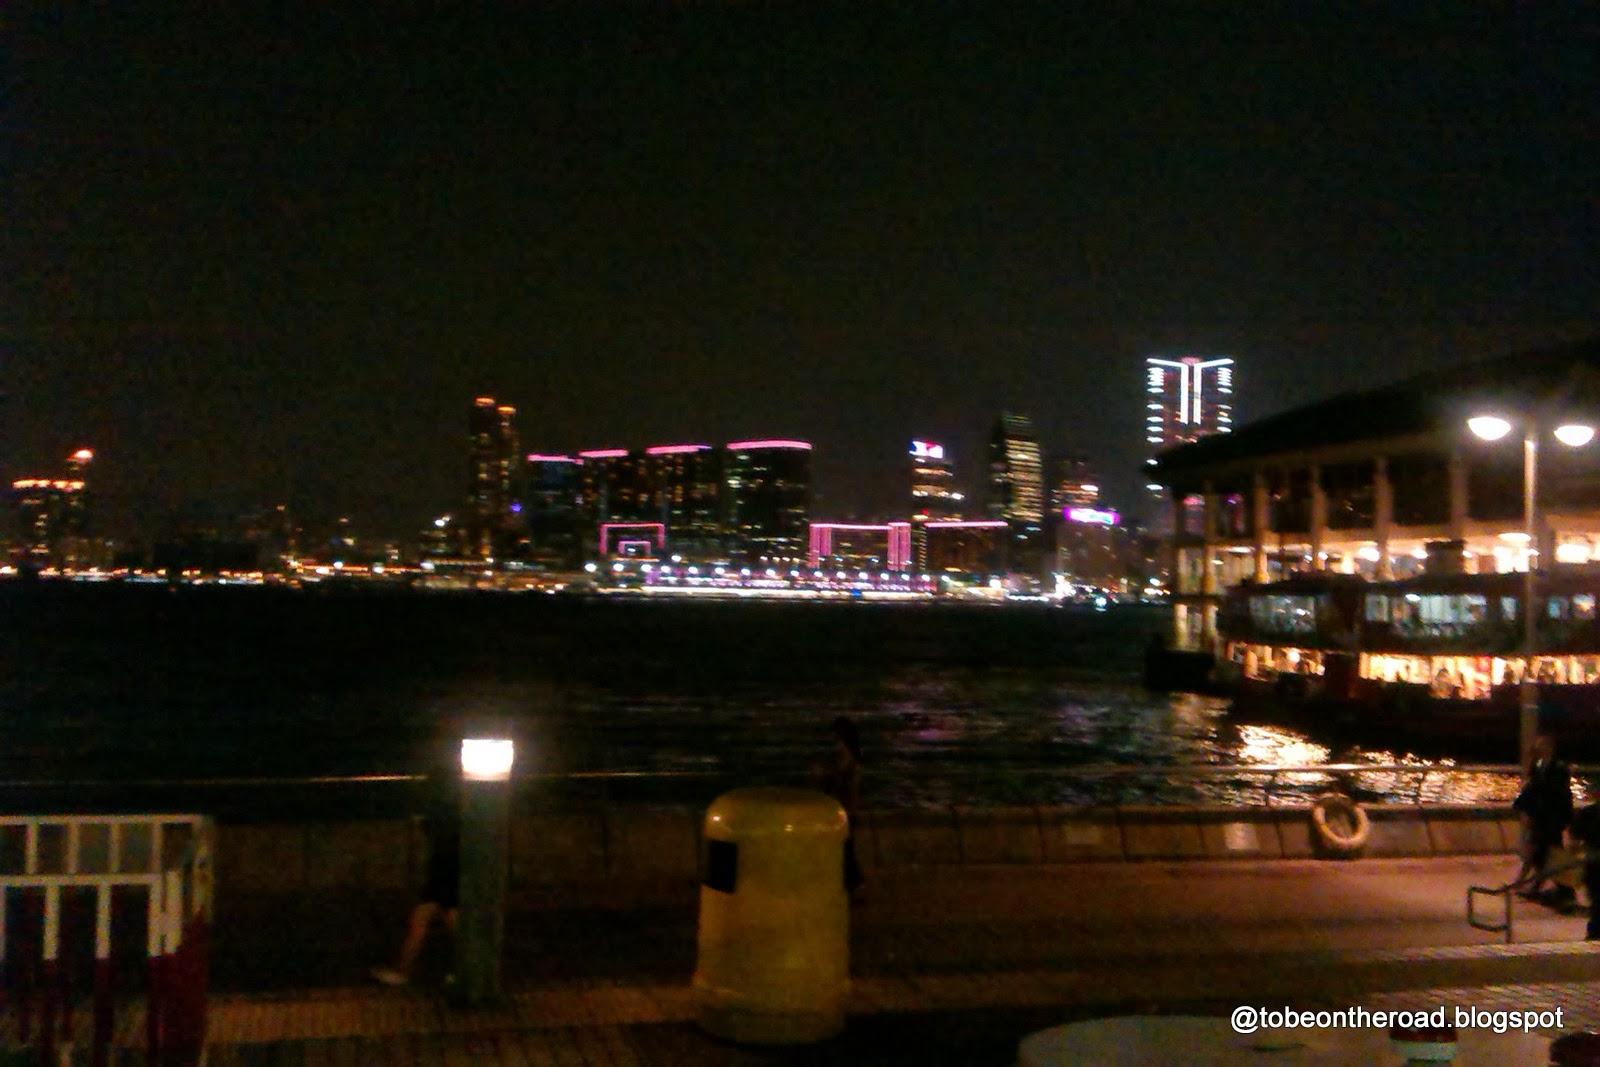 Hongkong,Symphony Of Lights,Star Ferry,Skyscraper,Lantau,Tai O